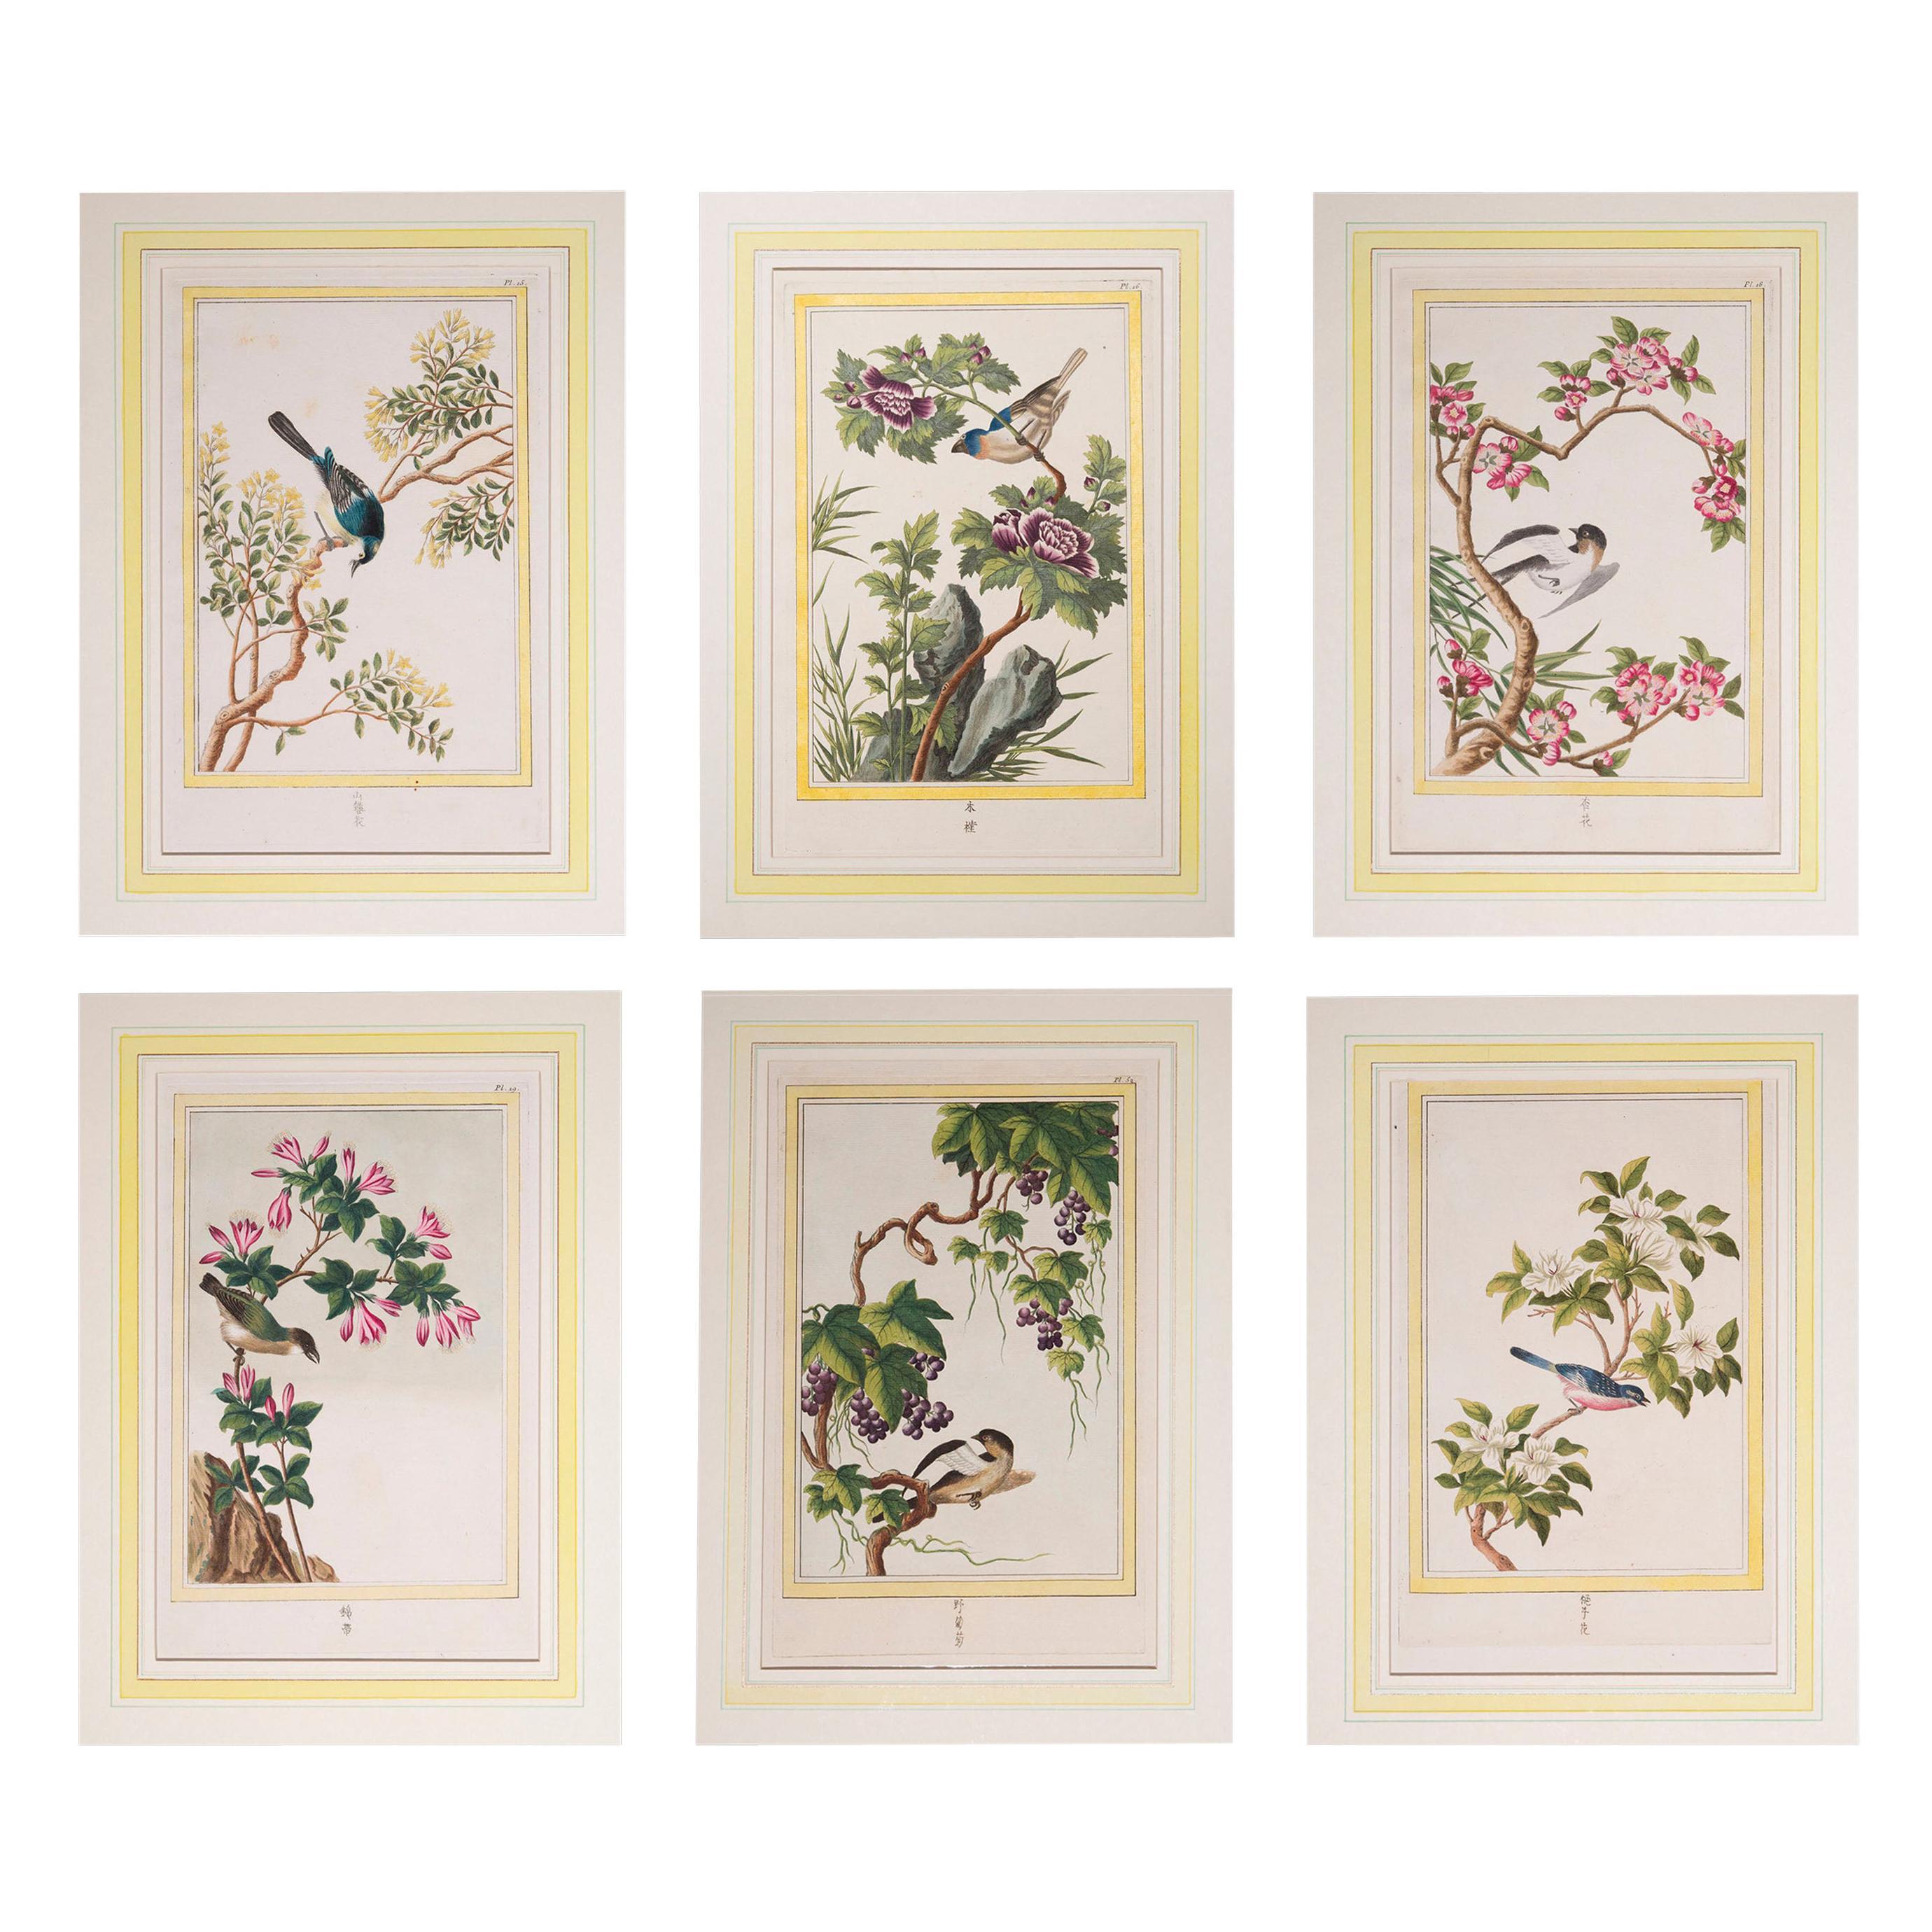 Six Antique 18th Century Botanical Prints Engravings, by P.J. Buchoz, 1776